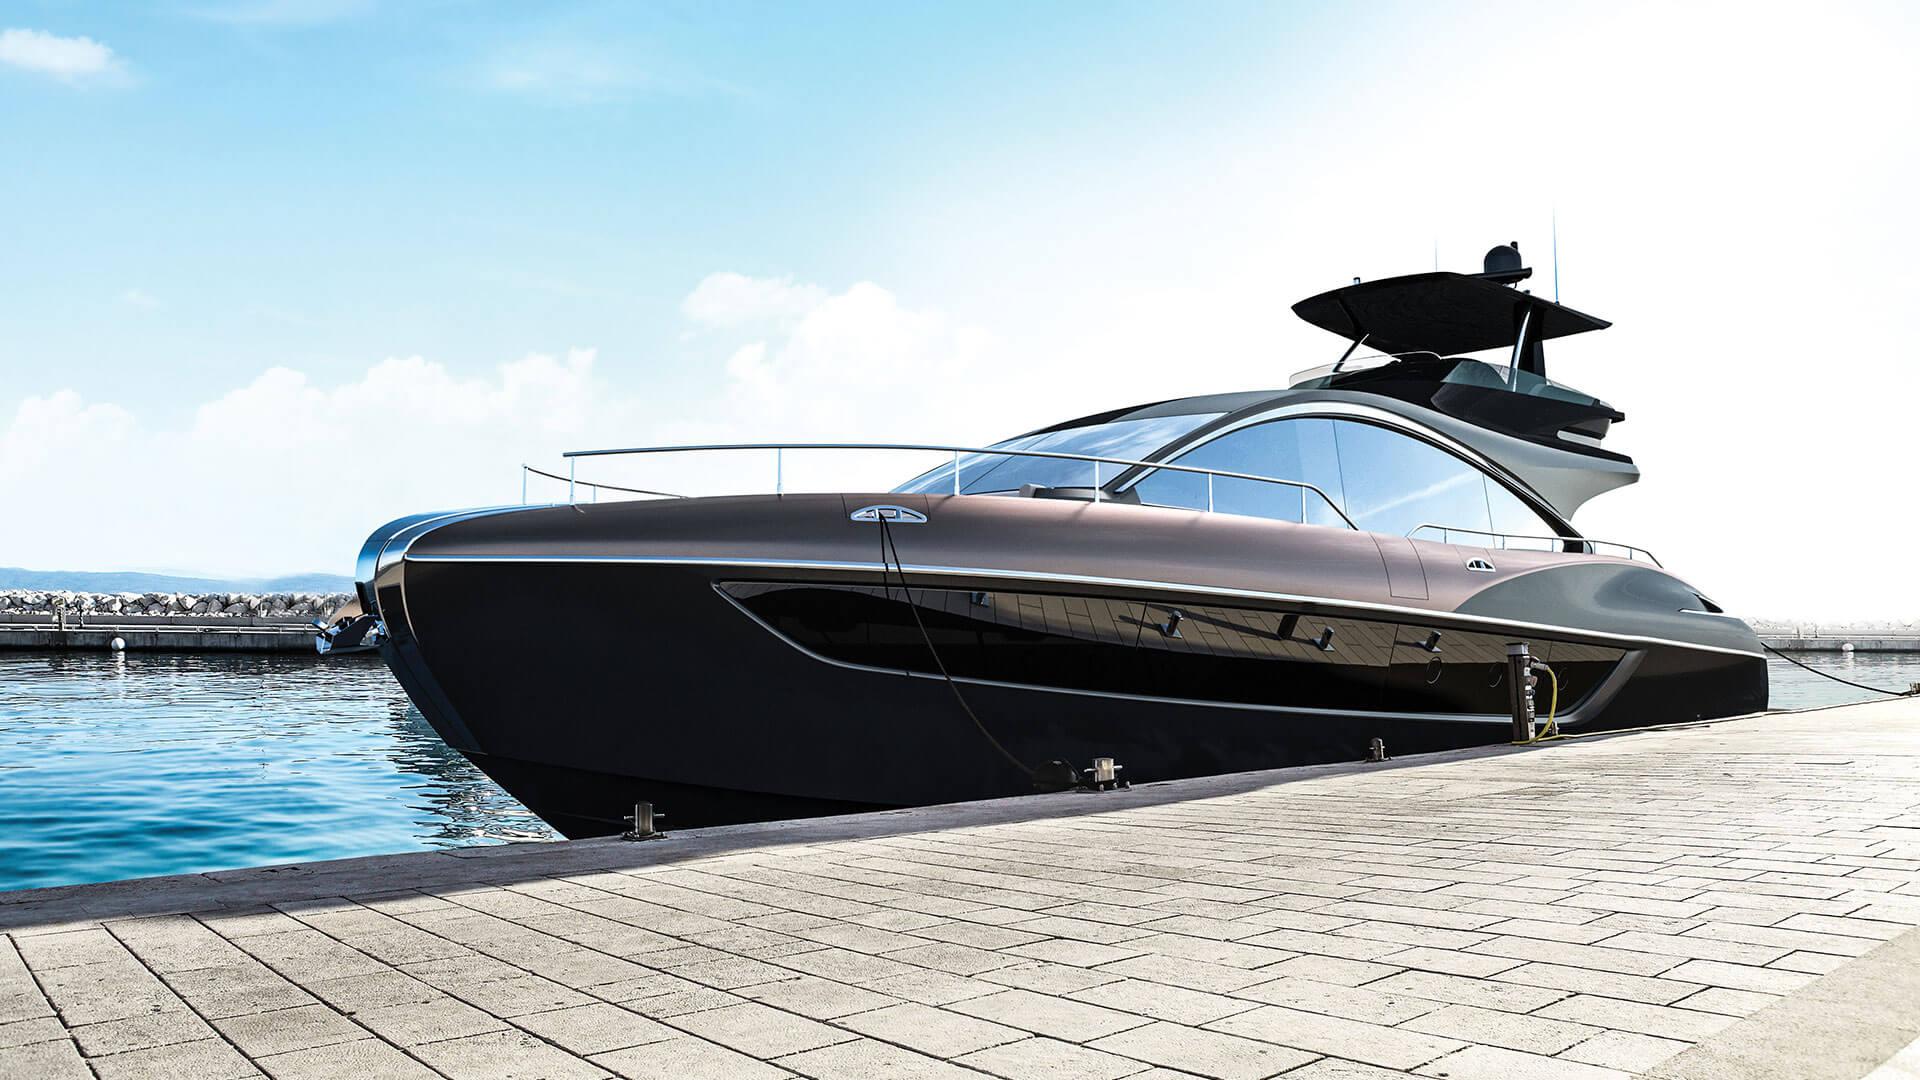 2019 lexus ly 650 luxury yacht landscape